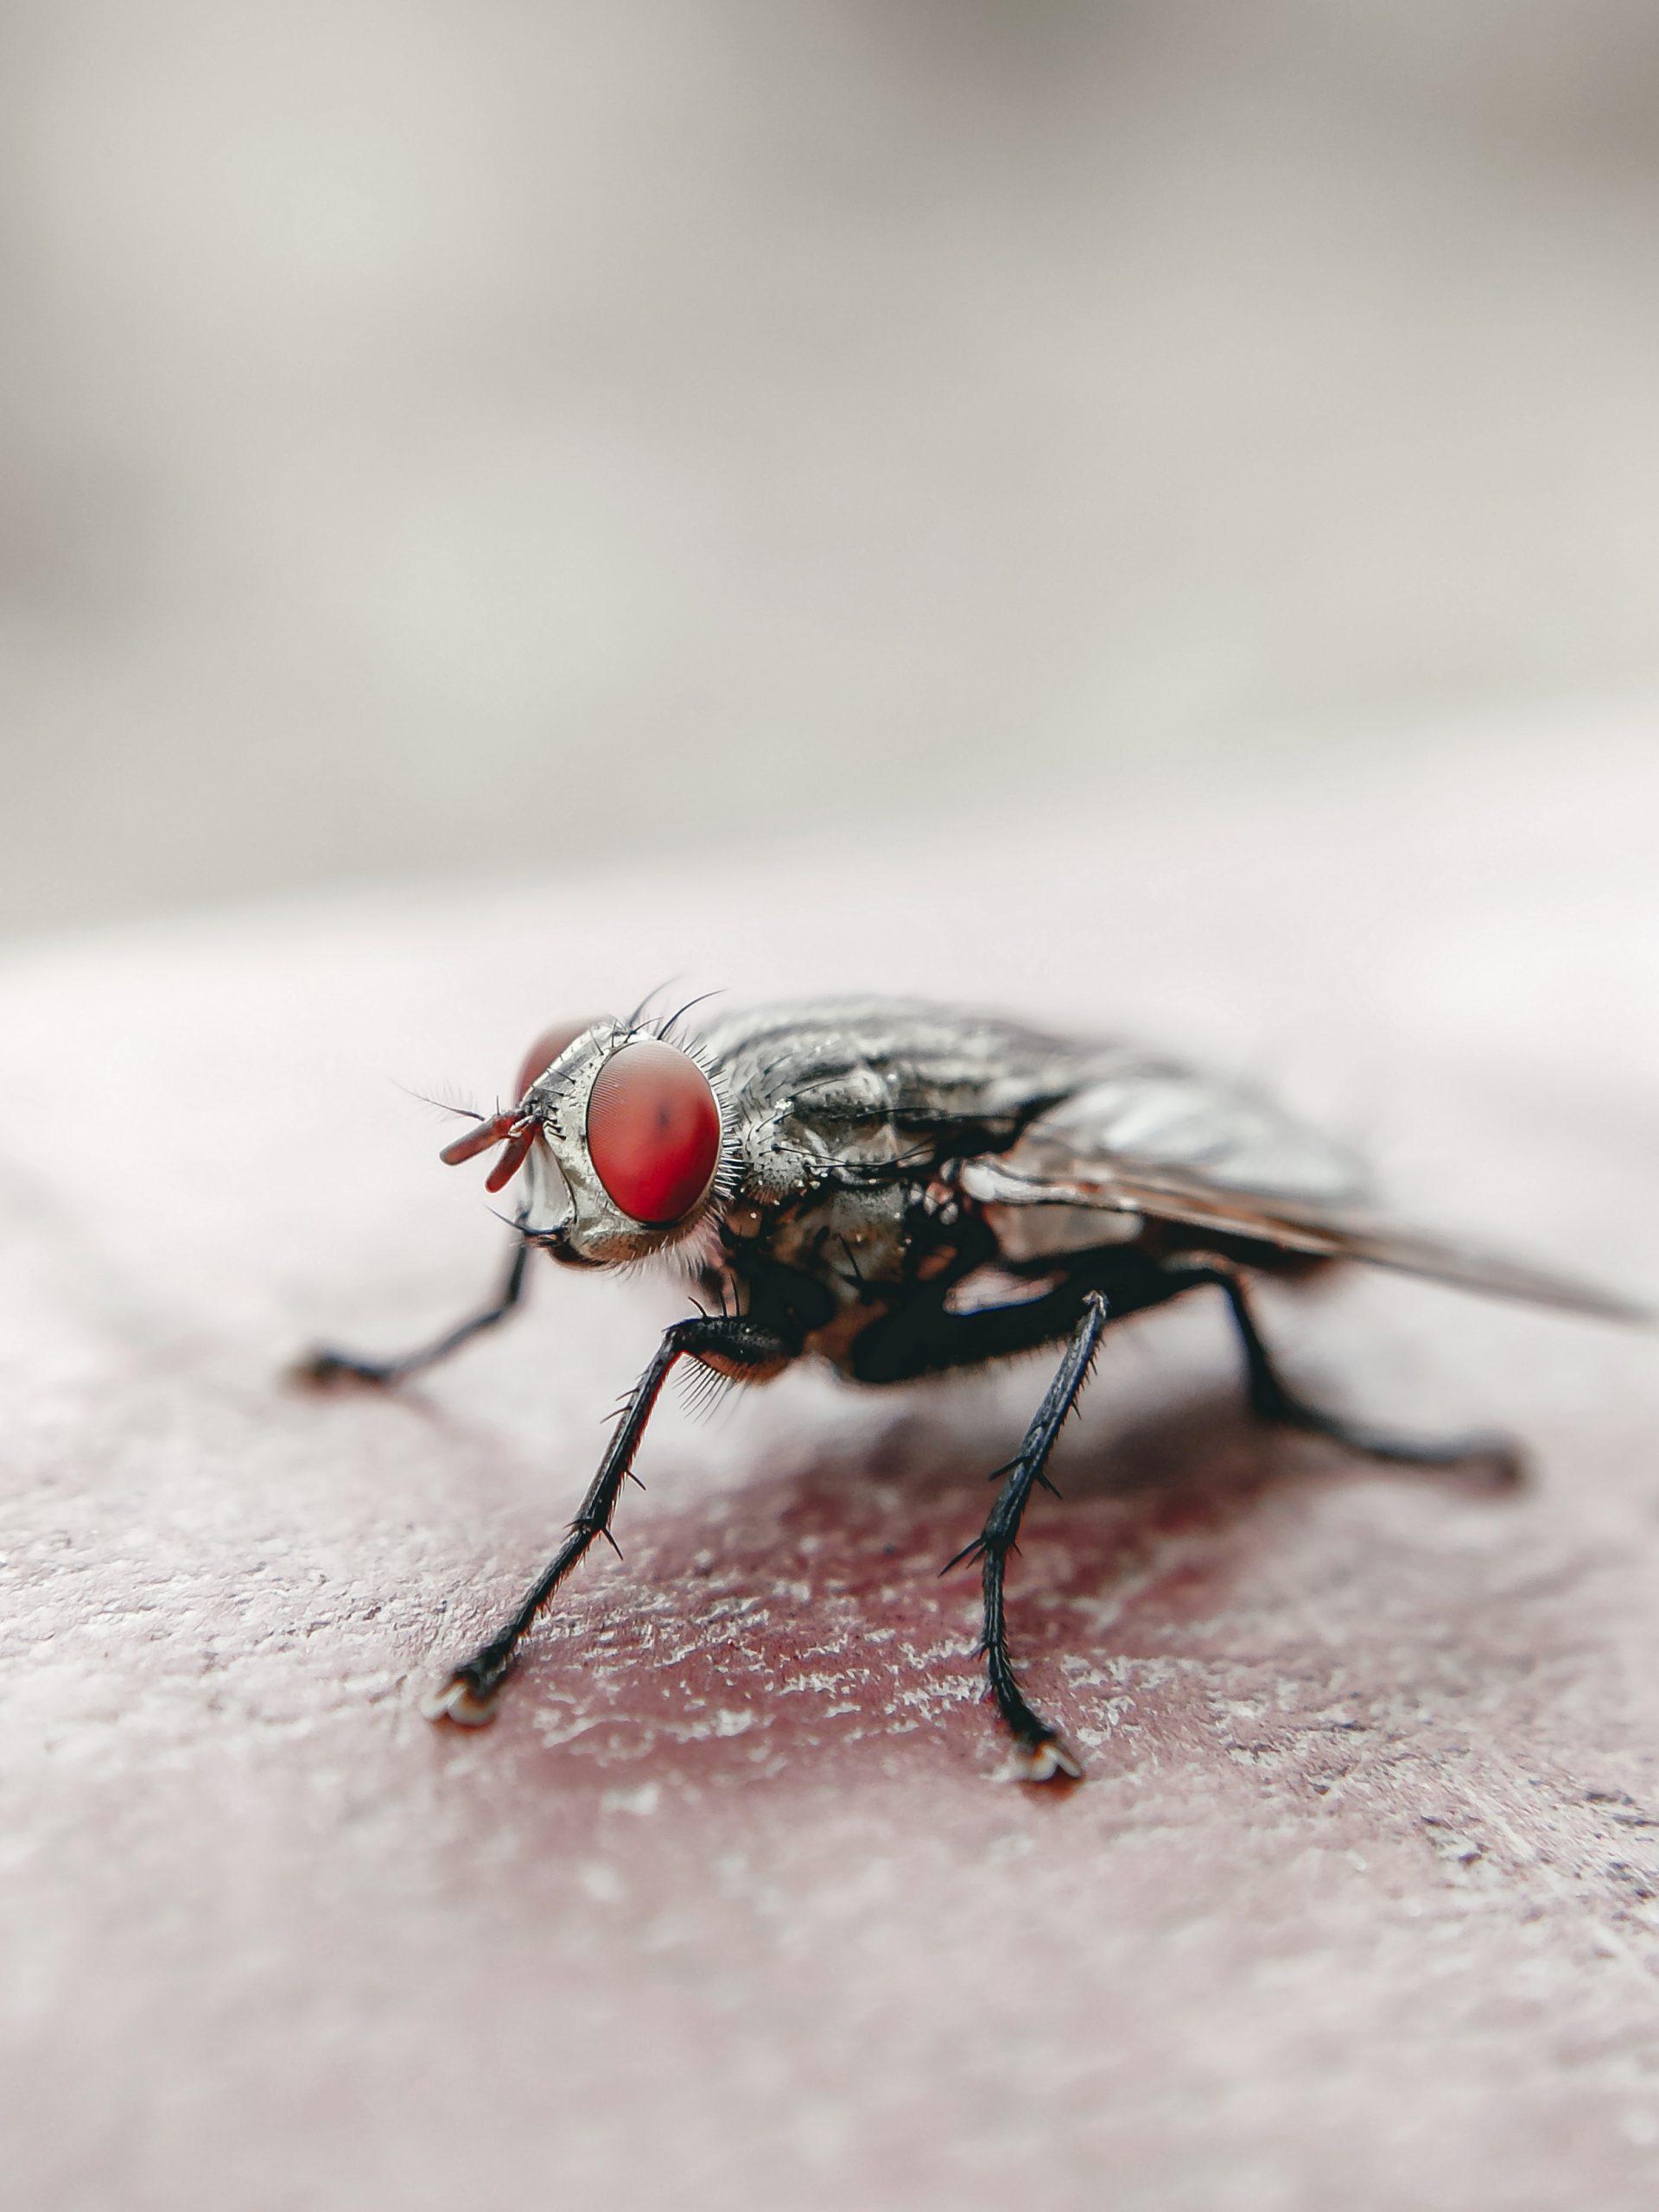 A housefly